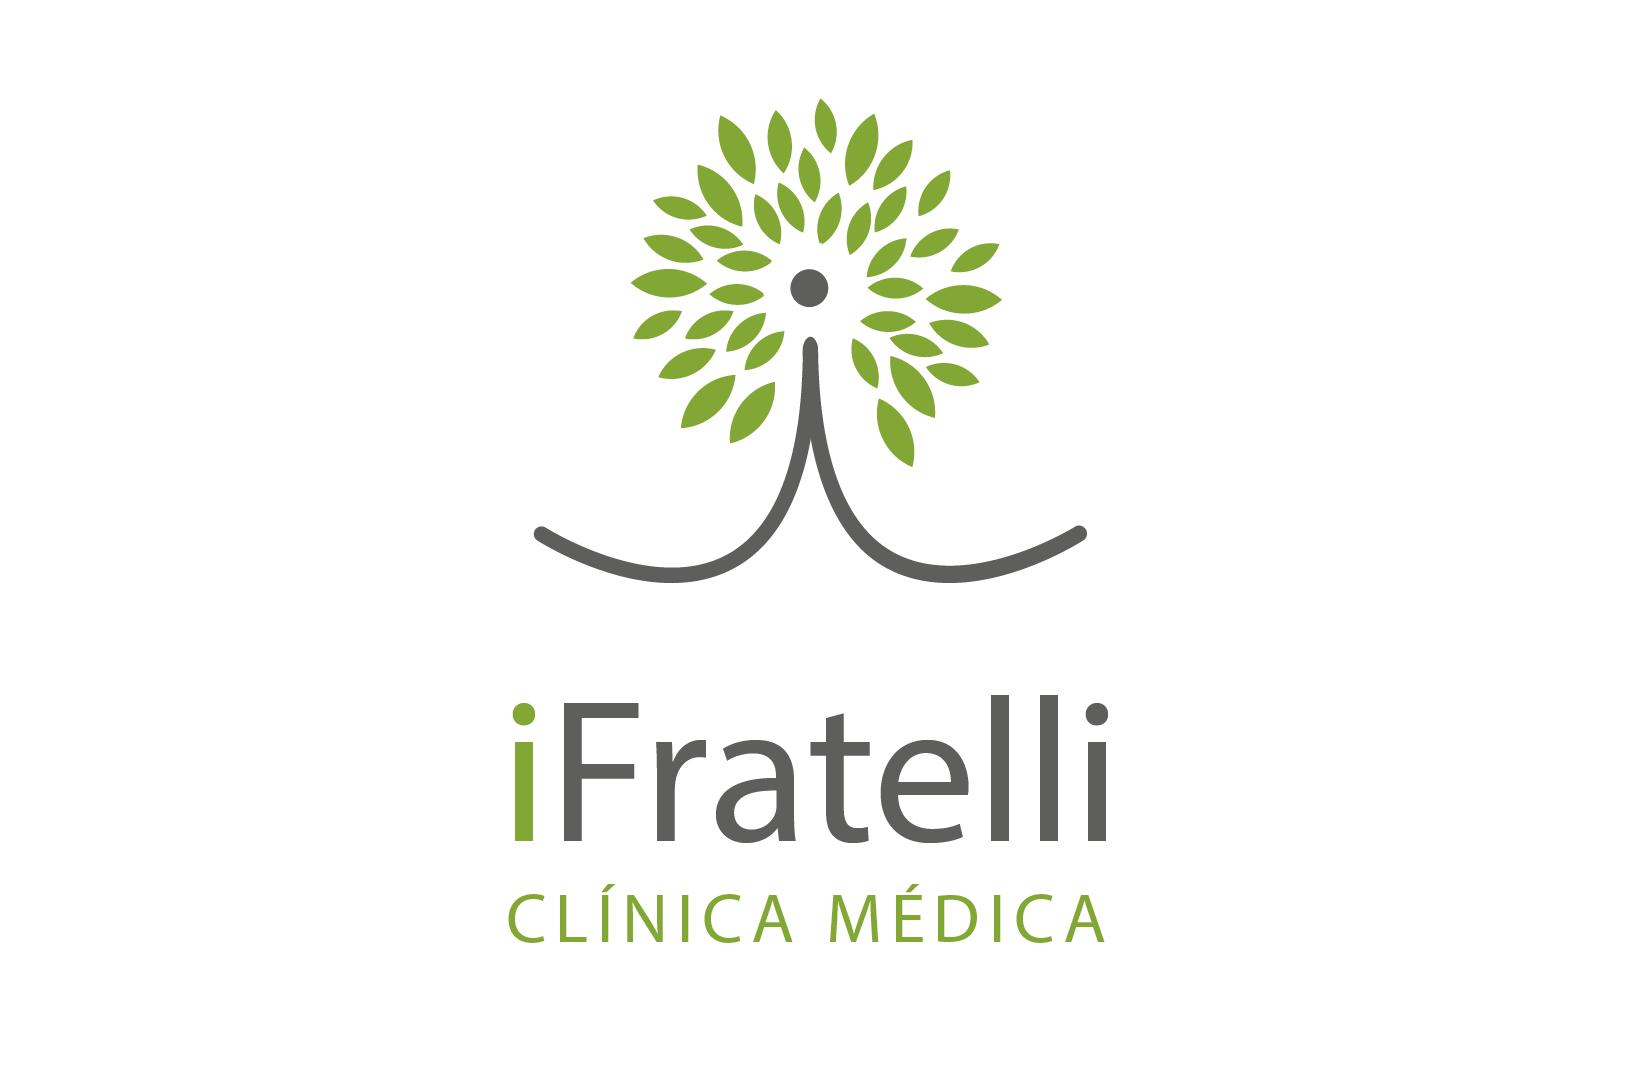 iFratelli Clínica Médica